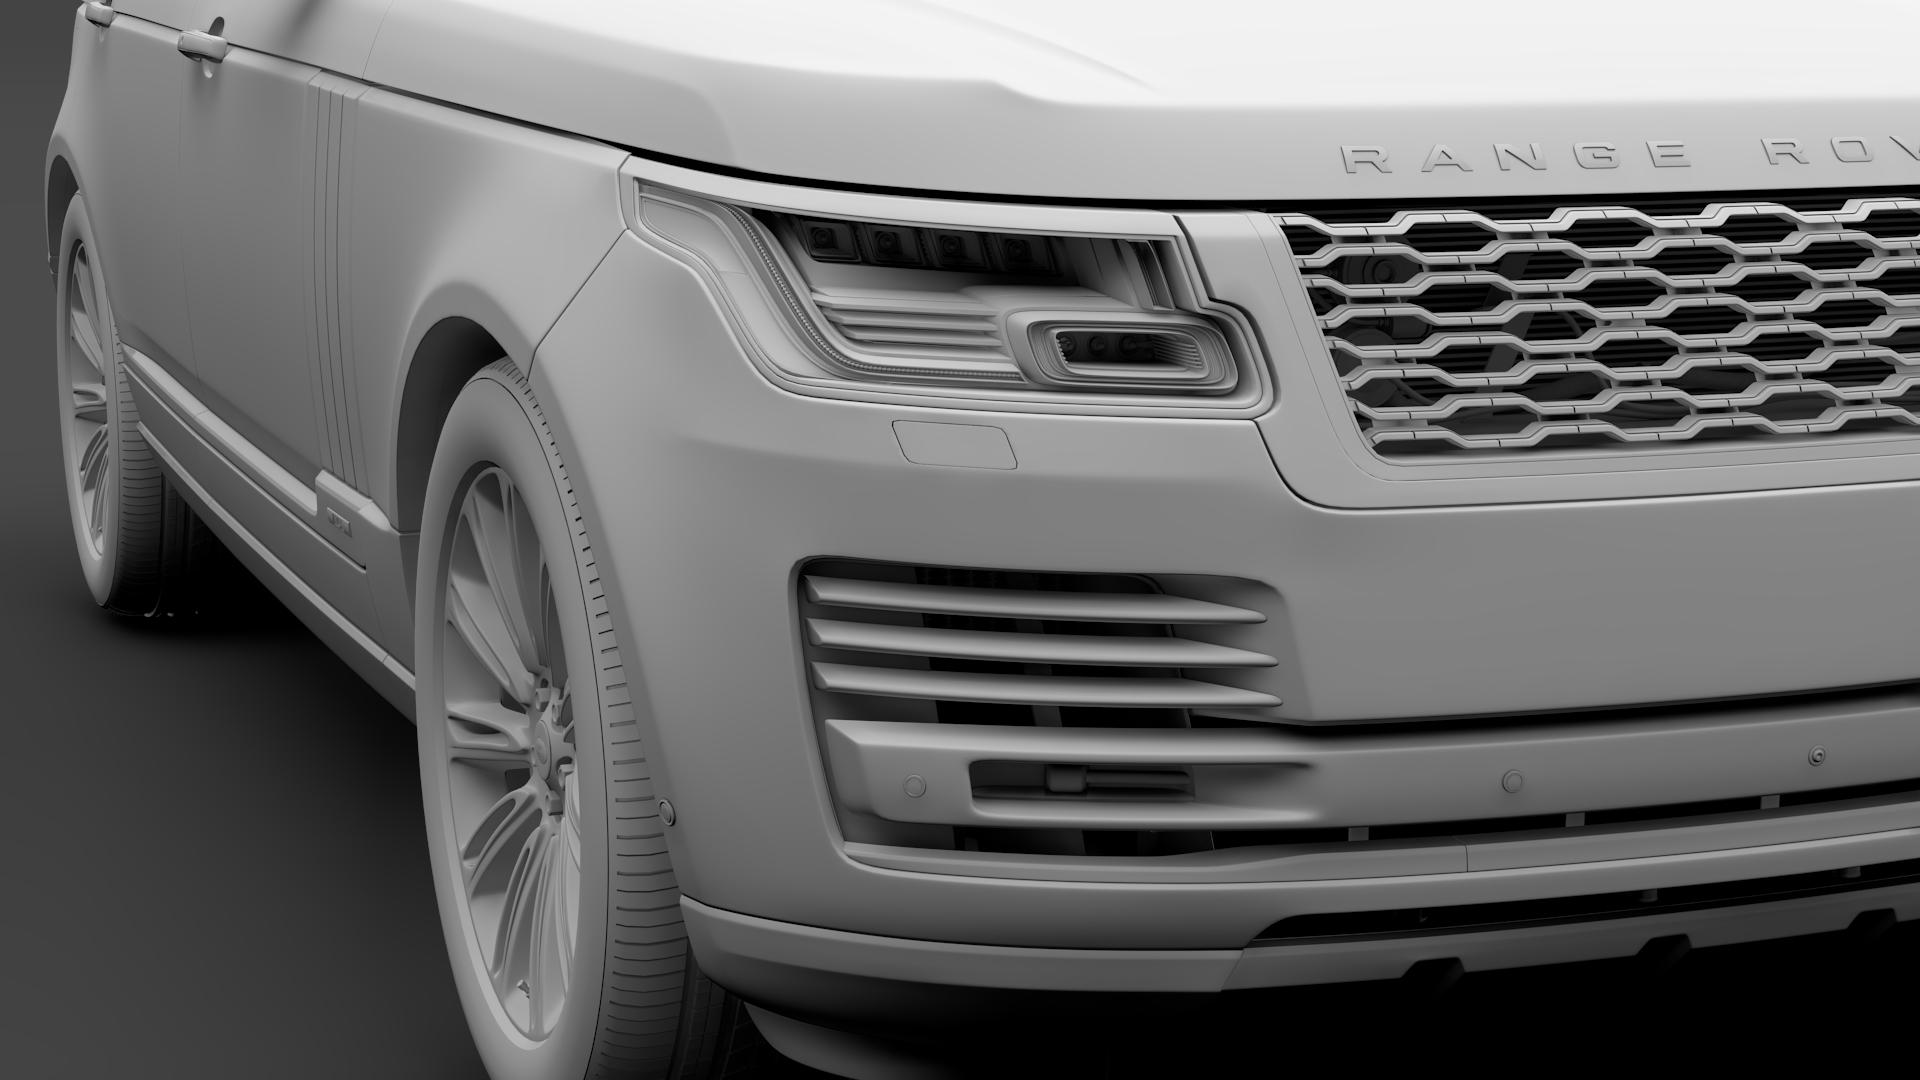 range rover autobiography lwb l405 2018 3d model max fbx c4d lwo ma mb hrc xsi obj 277336